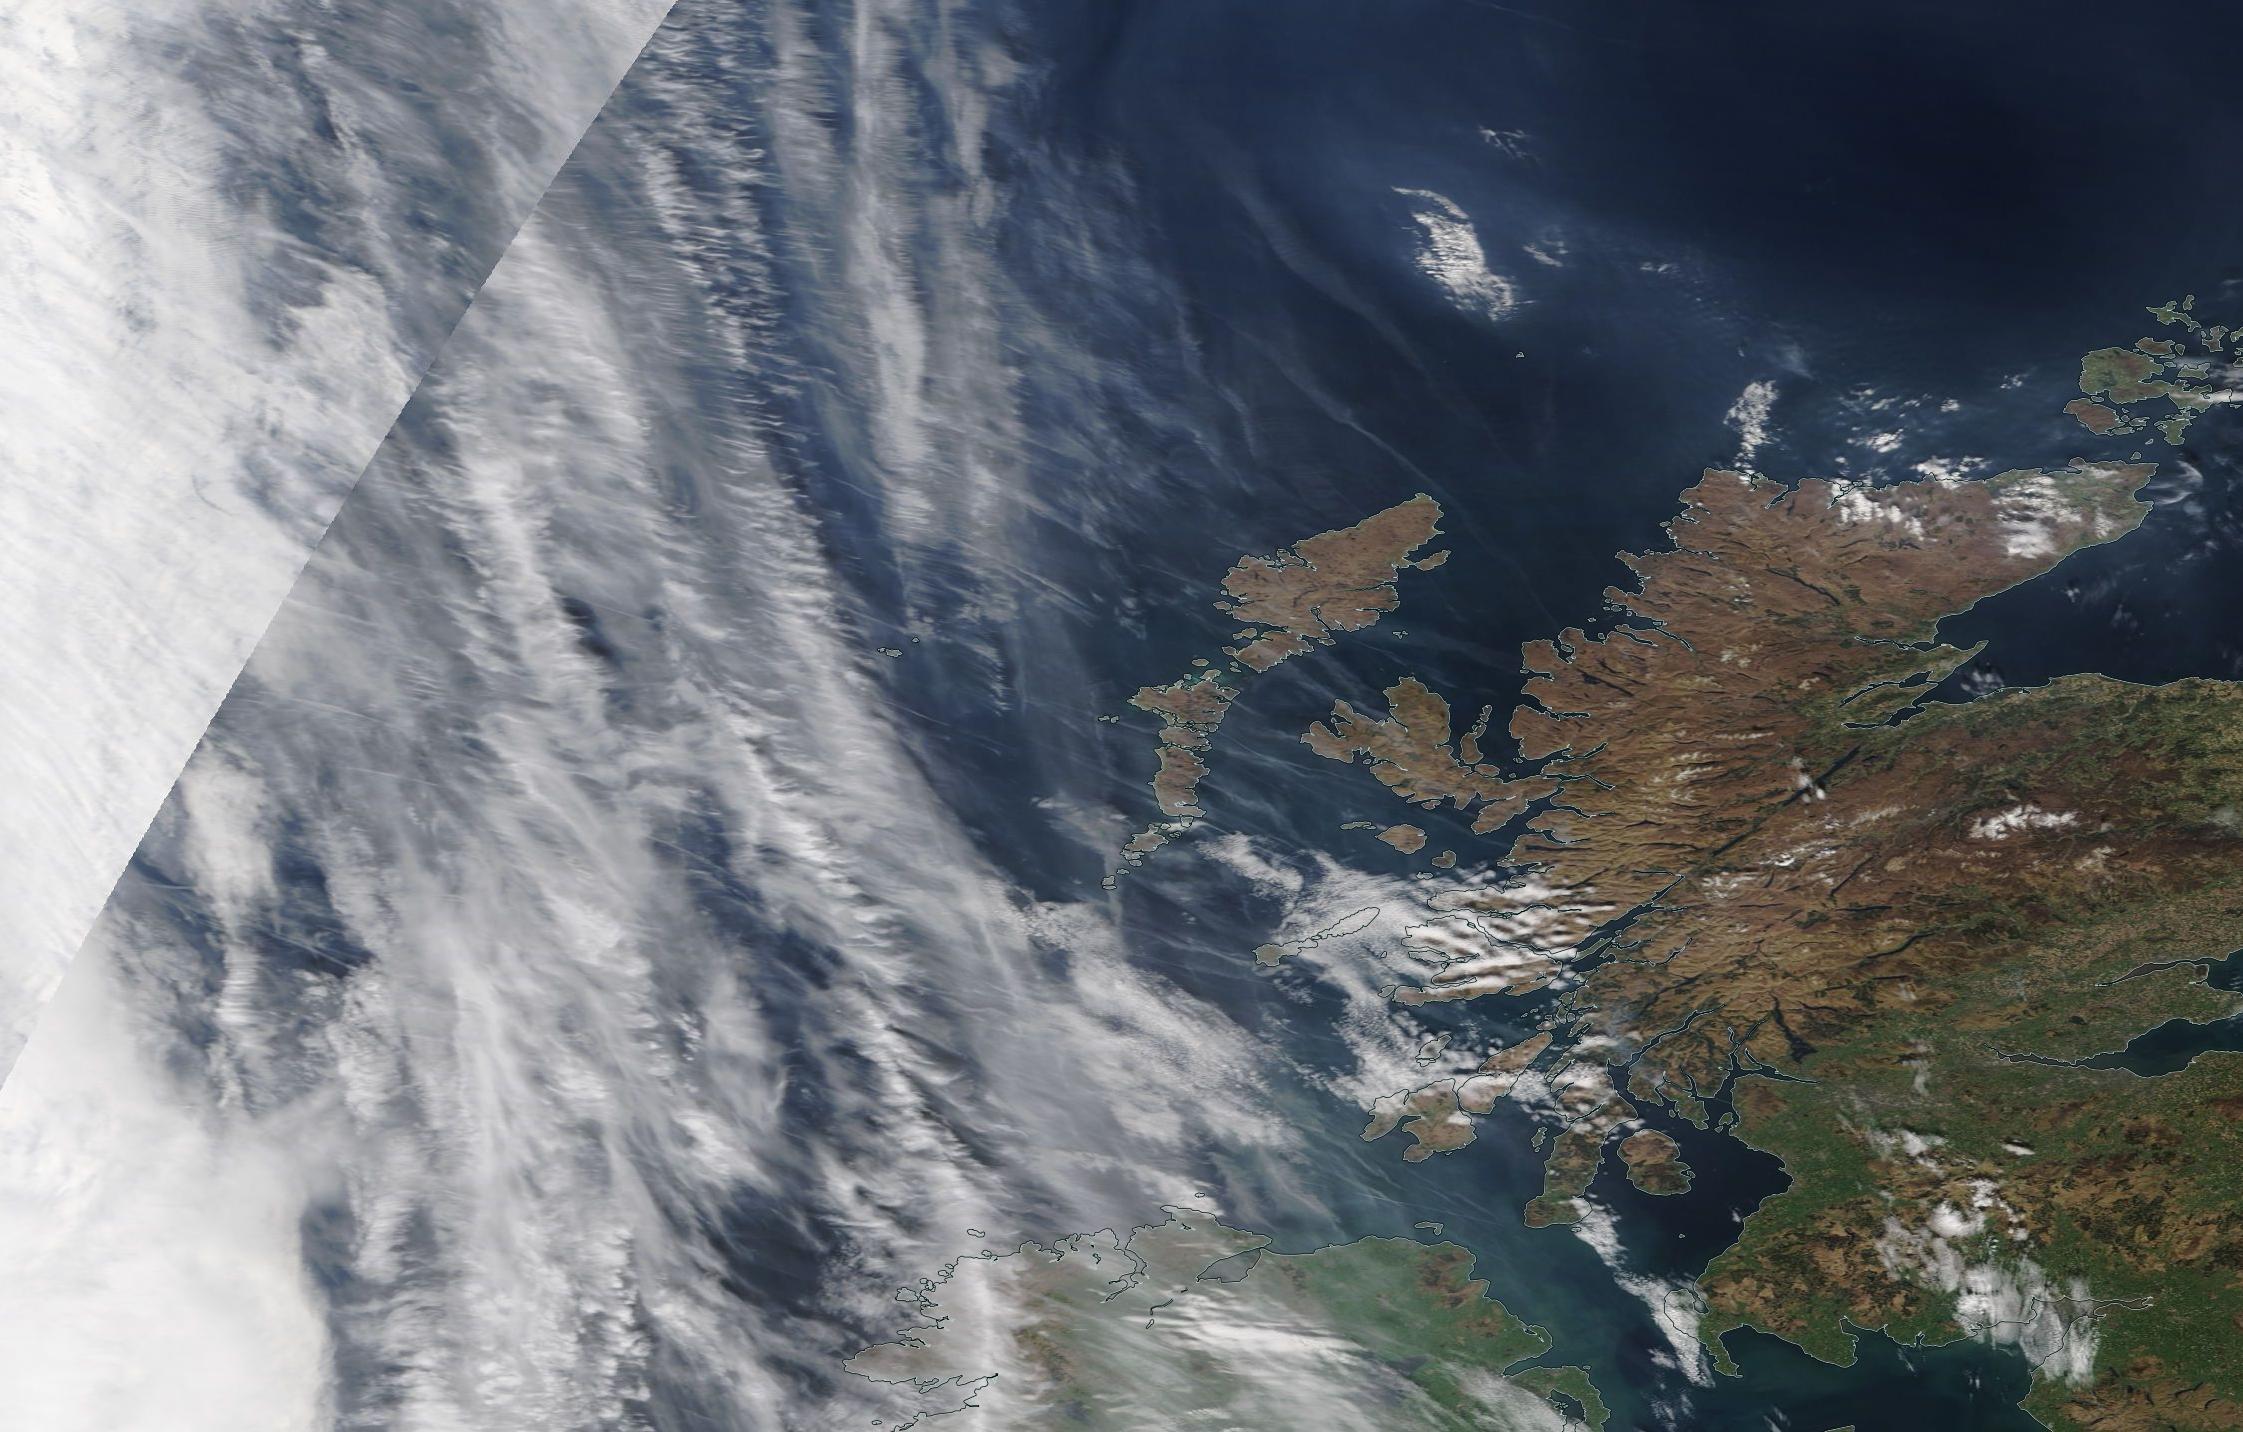 chemtrail geoengineering Outer Hebrides 19th April 2019 captured 1700 BST ... https://go.nasa.gov/2UHmFX0